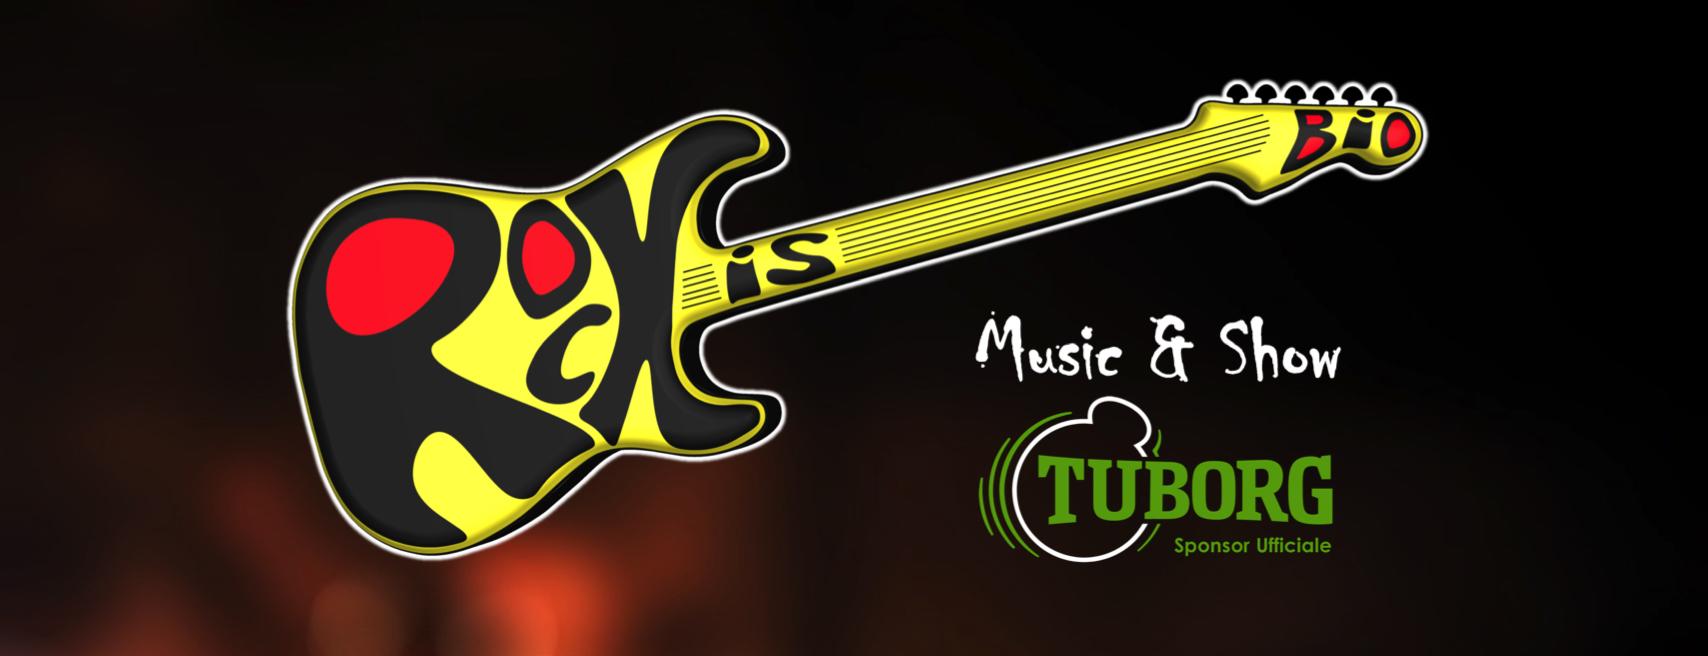 Imagem logotipo tuborg contest 2019